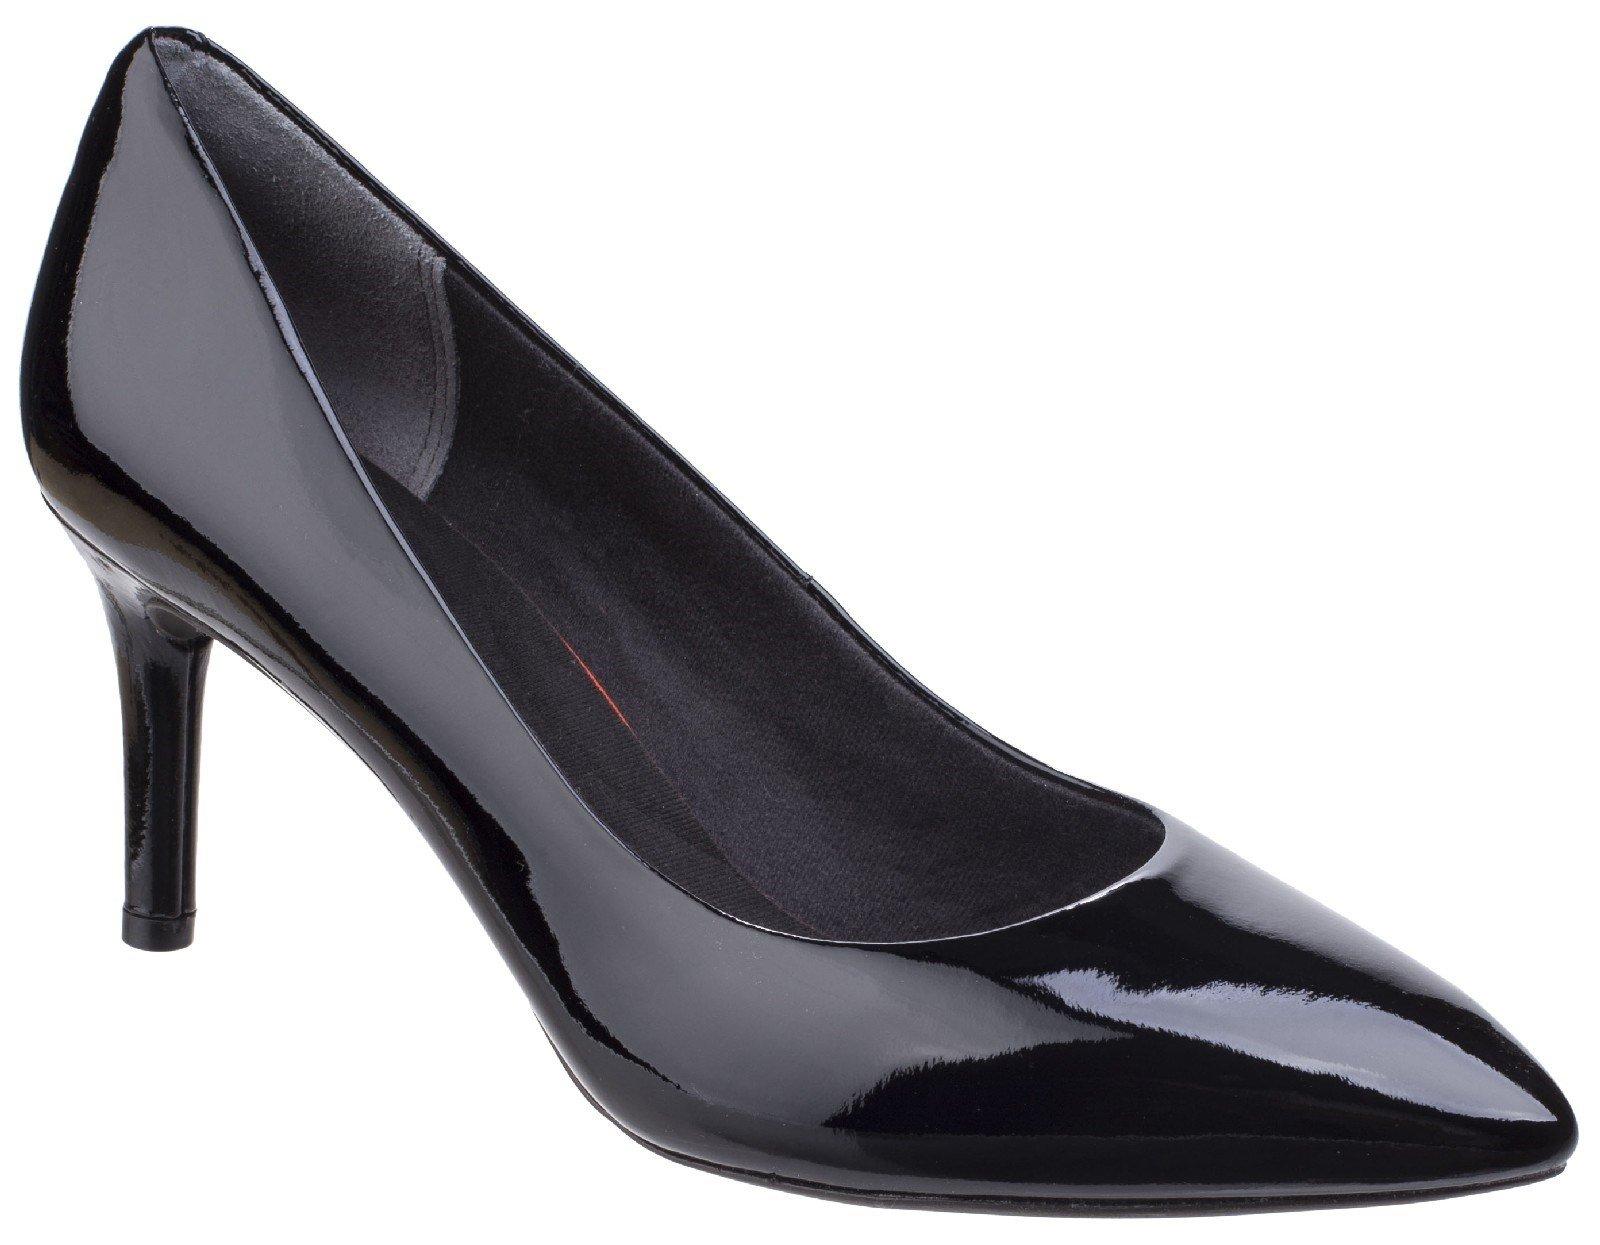 Rockport Women's Total Motion Stiletto Heel Various Colours 26347 - Black Patent 4